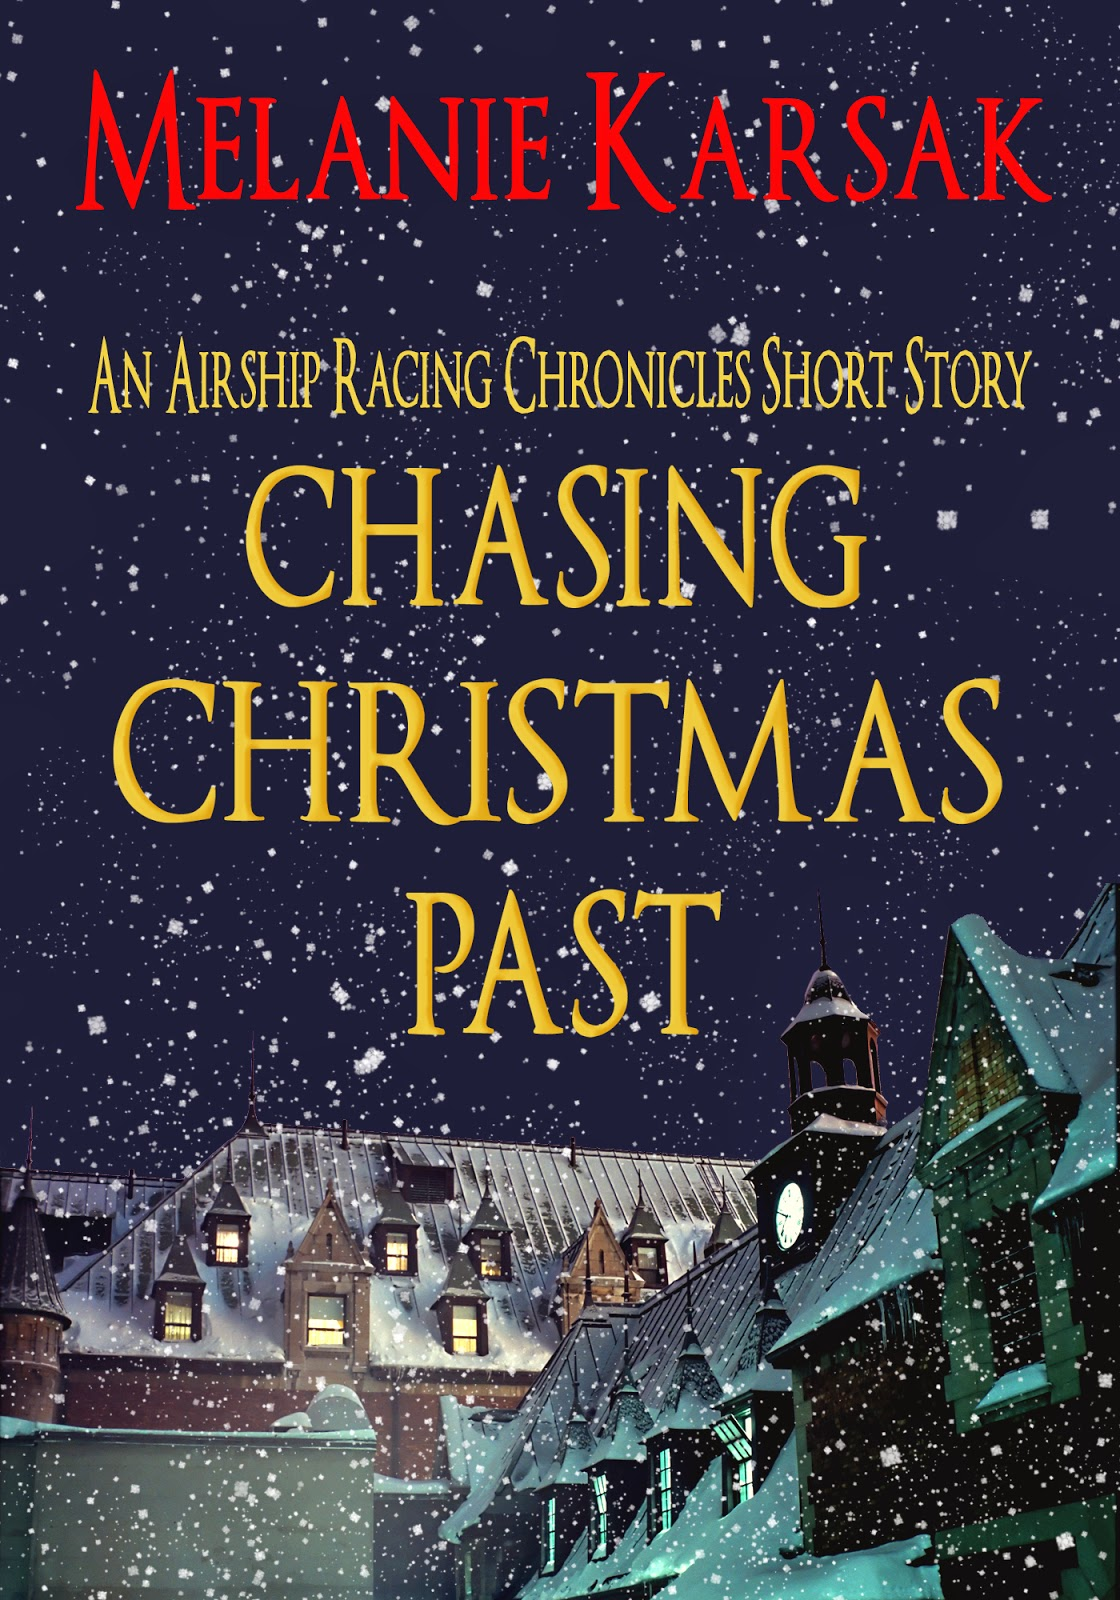 Chasing Christmas.Clockpunk Press Chasing Christmas Past By Melanie Karsak